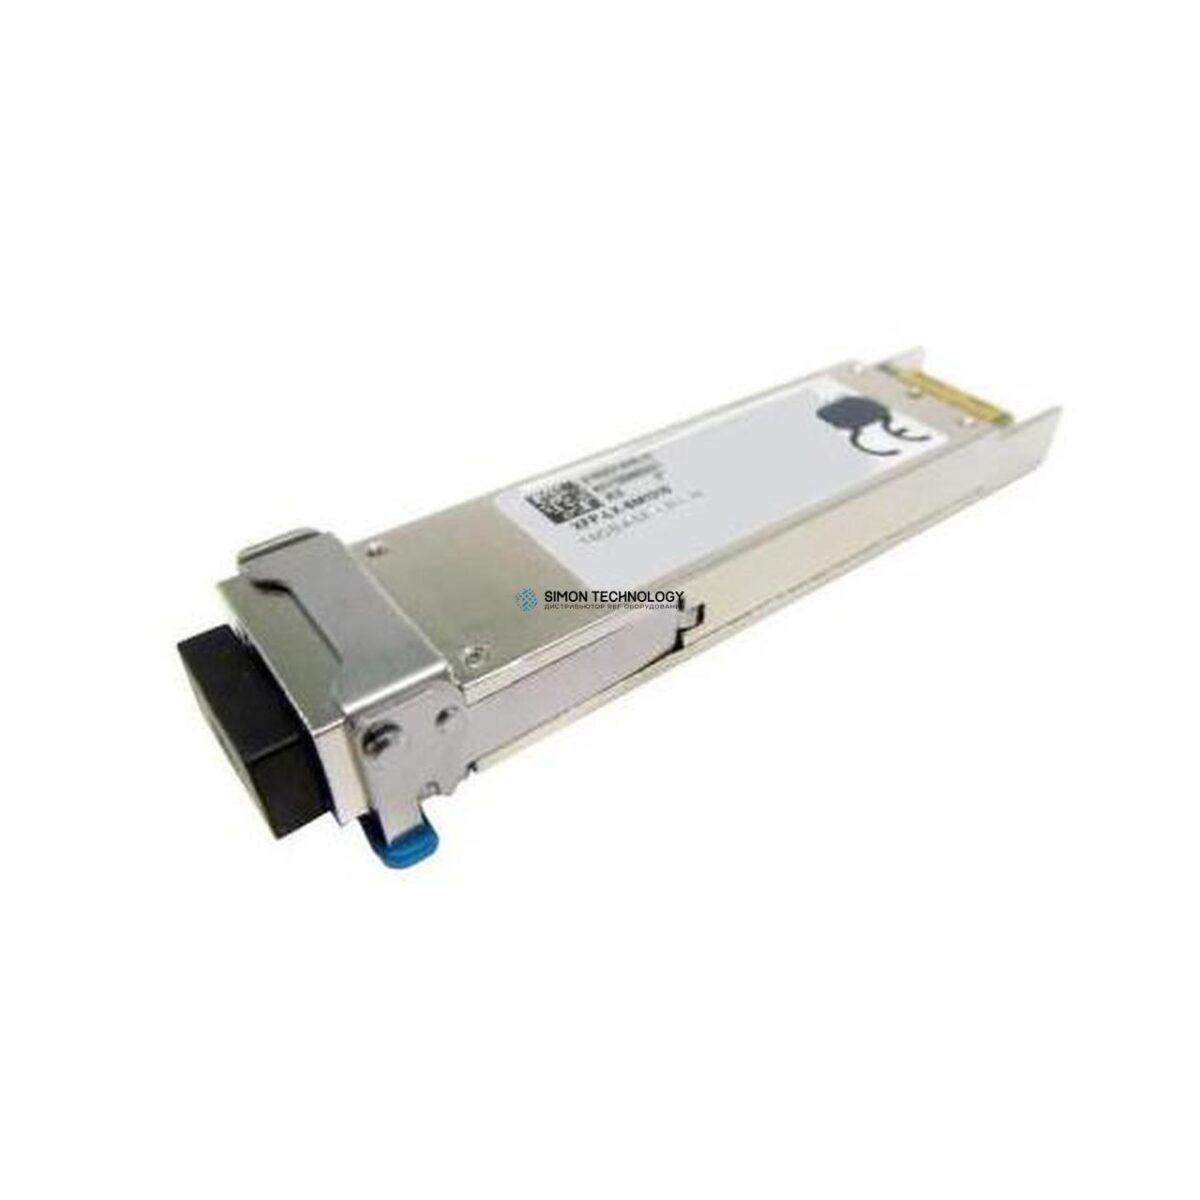 Трансивер SFP HP HPE X130 10G XFP LC LR 1310nm Transceiver (JD108-61201)